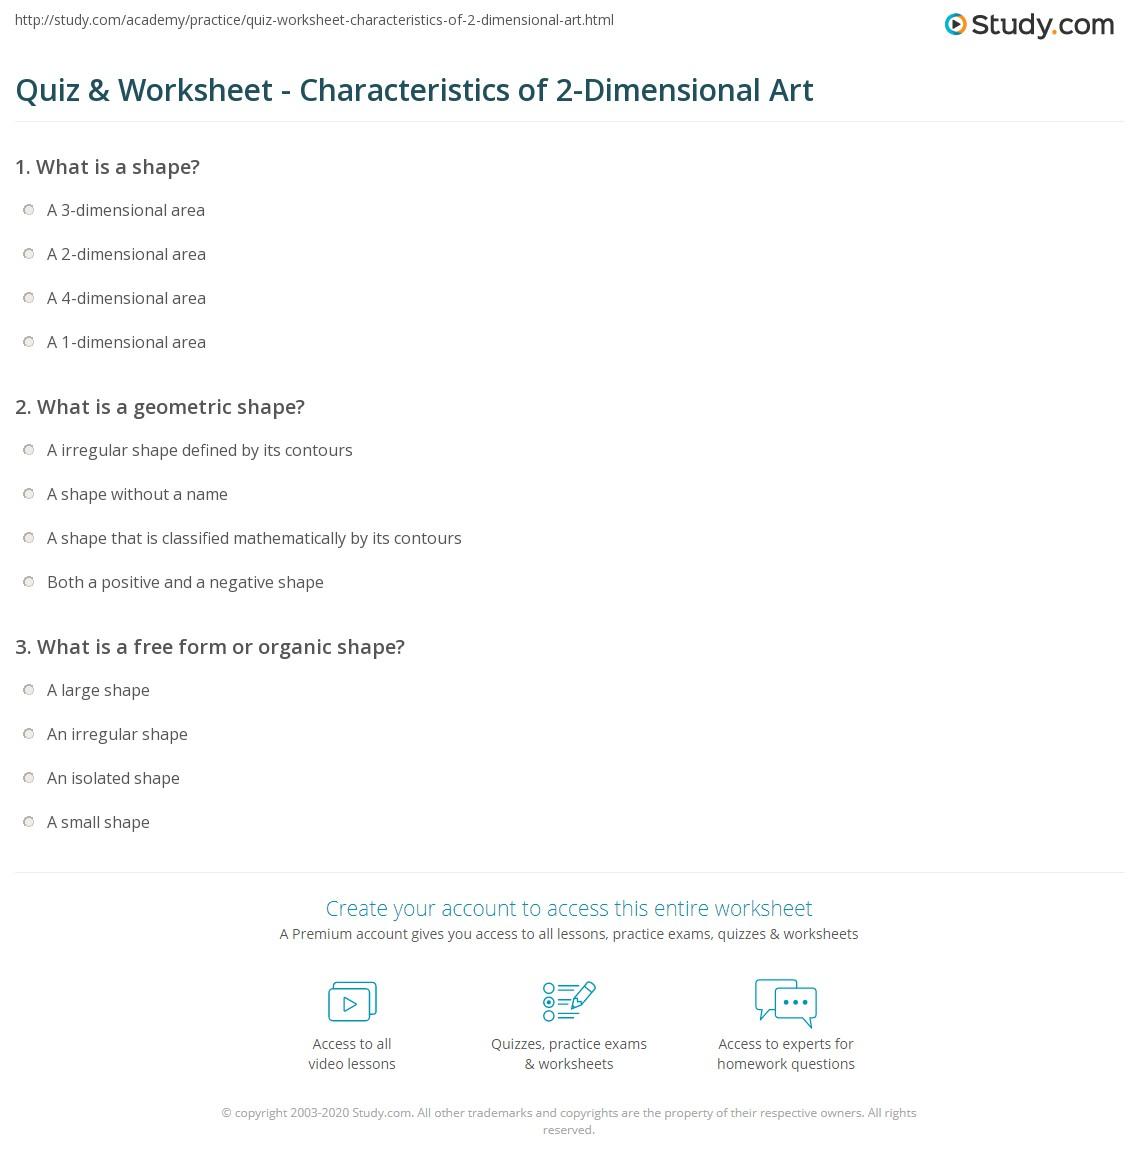 quiz & worksheet - characteristics of 2-dimensional art | study